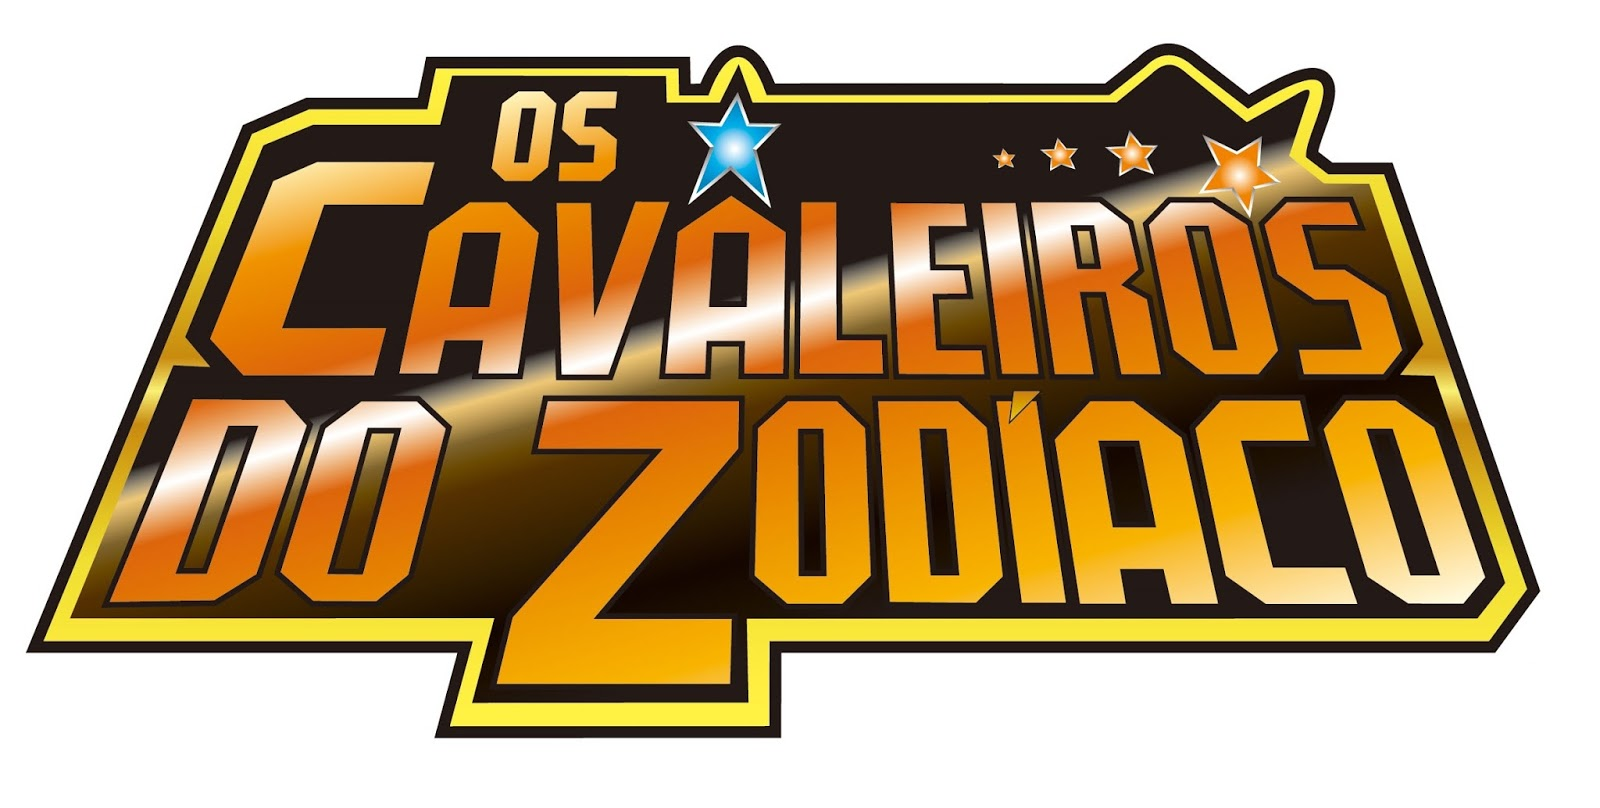 DOWNLOAD CAVALEIROS ZODIACO DE OVAS GRATUITO DO